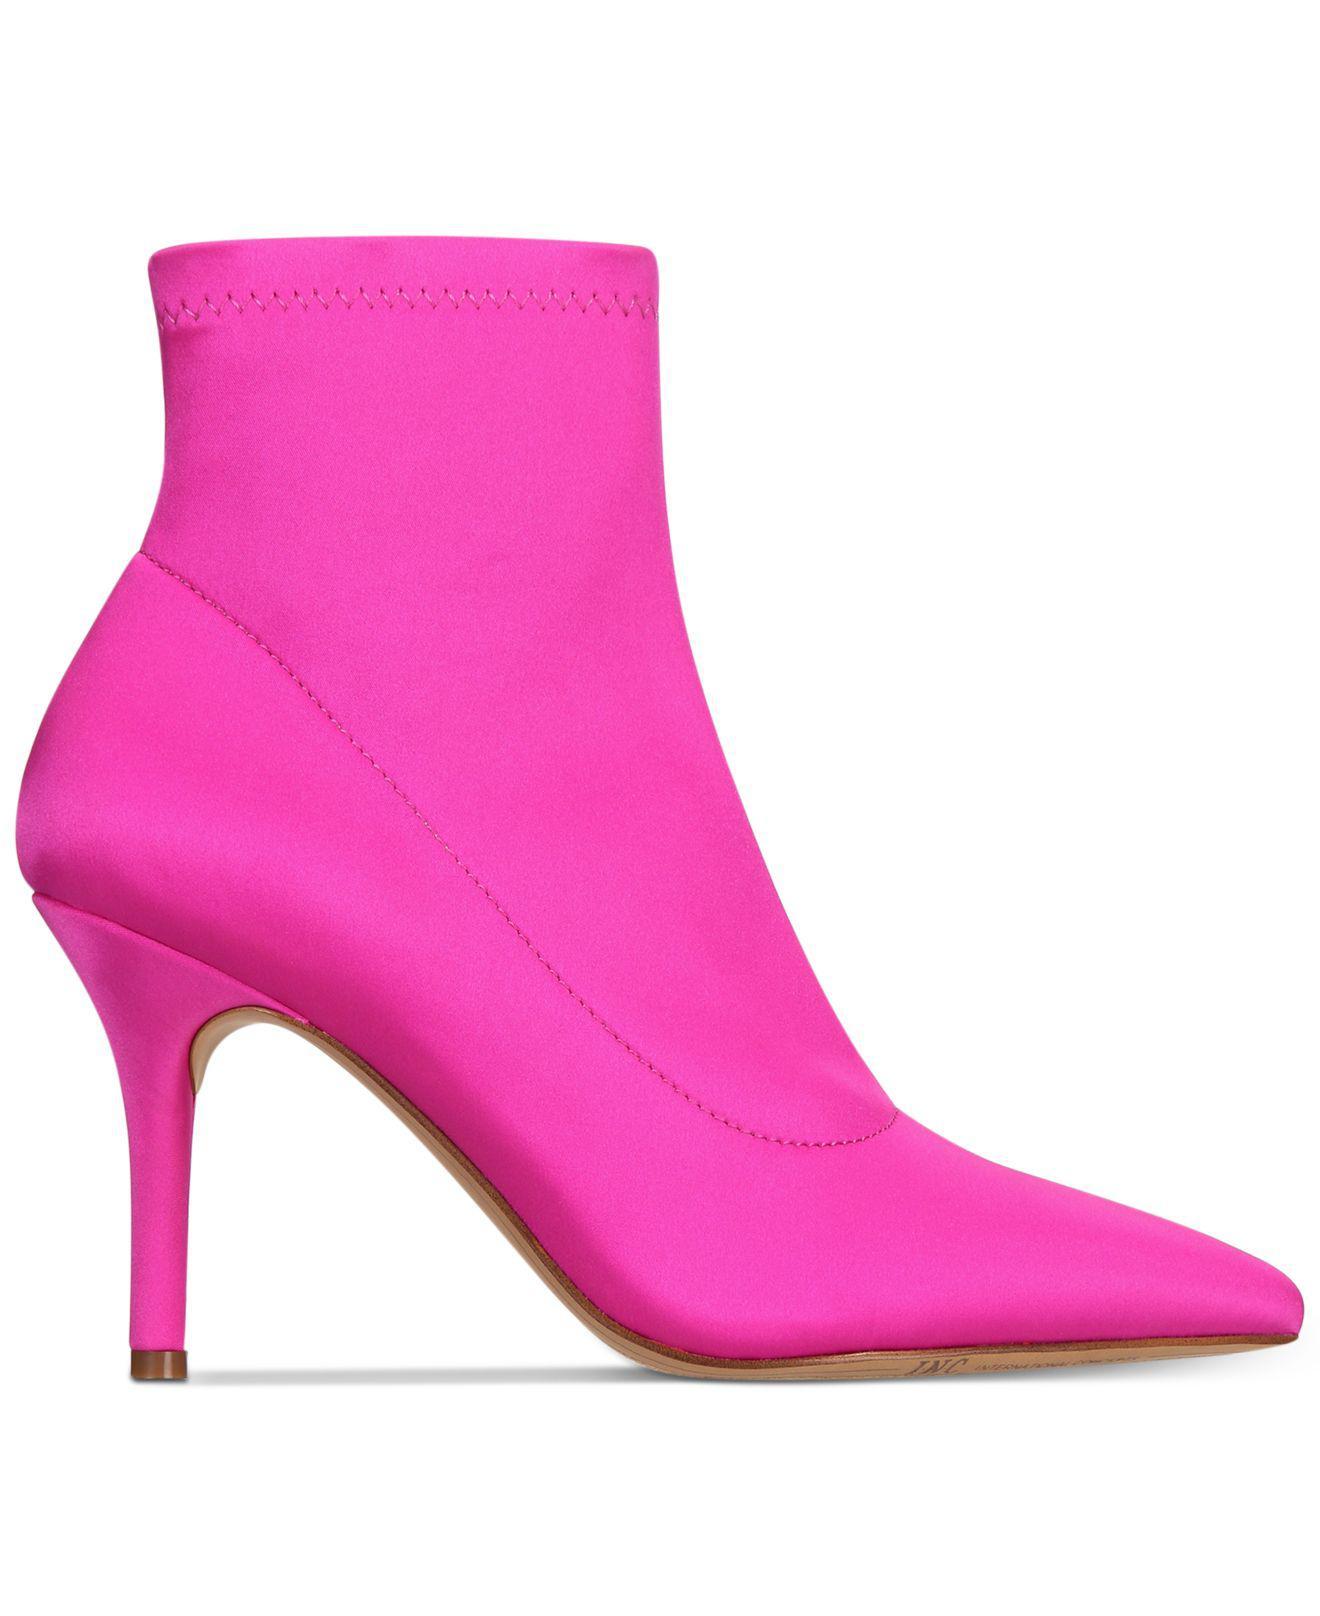 d8df1e1b43c1 INC International Concepts Womens Zetef Pointed Toe, Deep Fuchsia ...